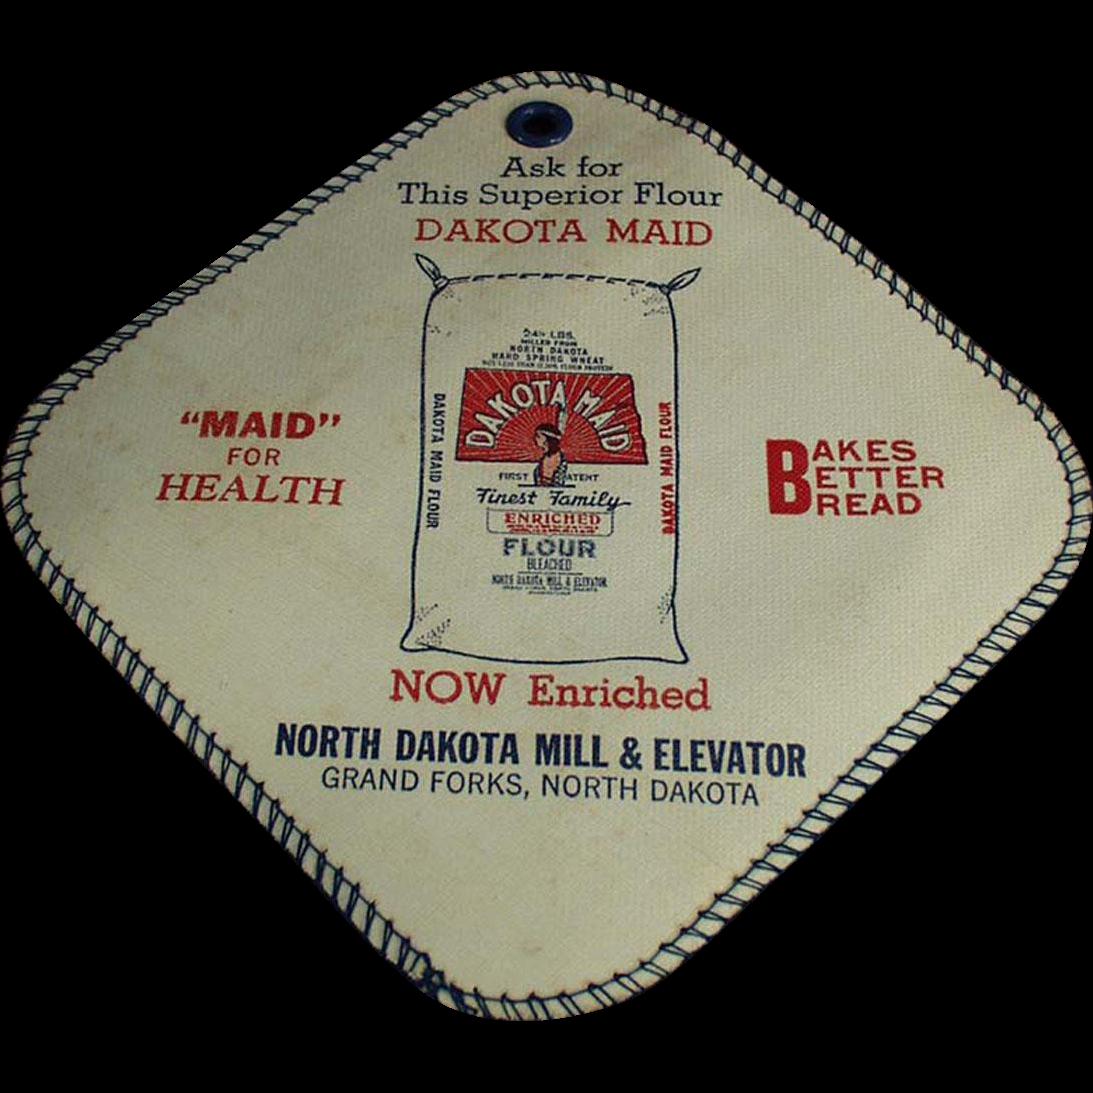 Vintage Advertising Potholder - Dakota Maid Flour- North Dakota Mill and Elevator Co.